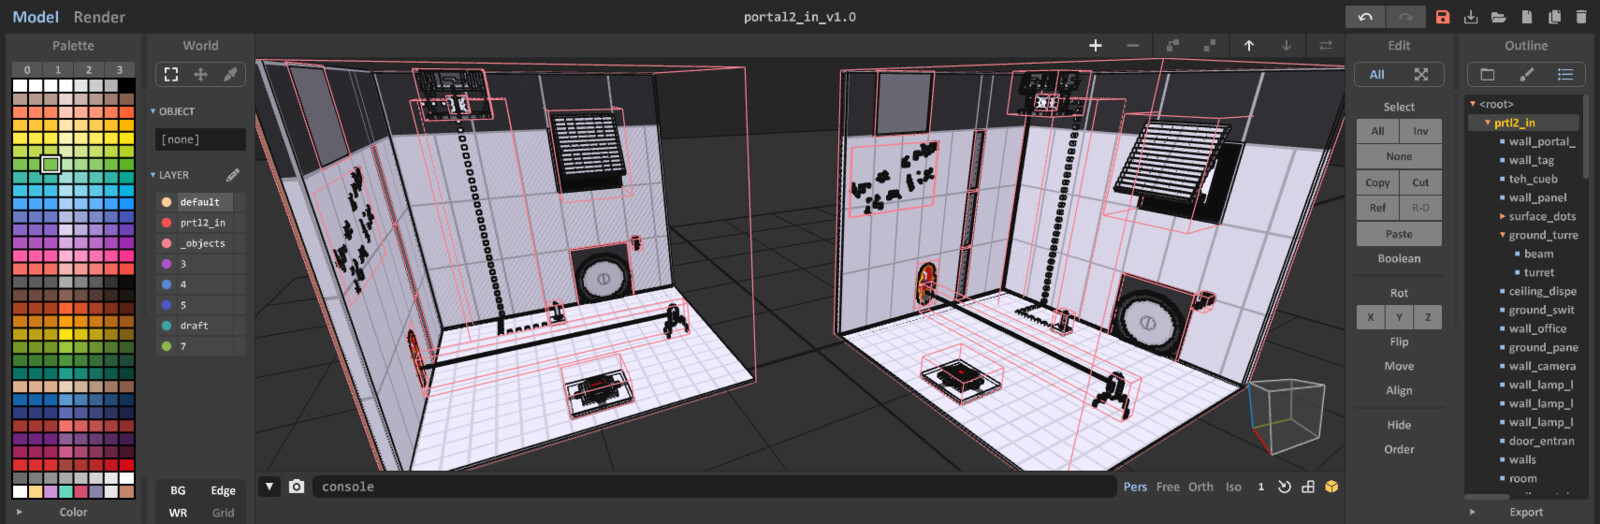 One Room: Portal 2 MagicaVoxel interface screenshot - November 2019